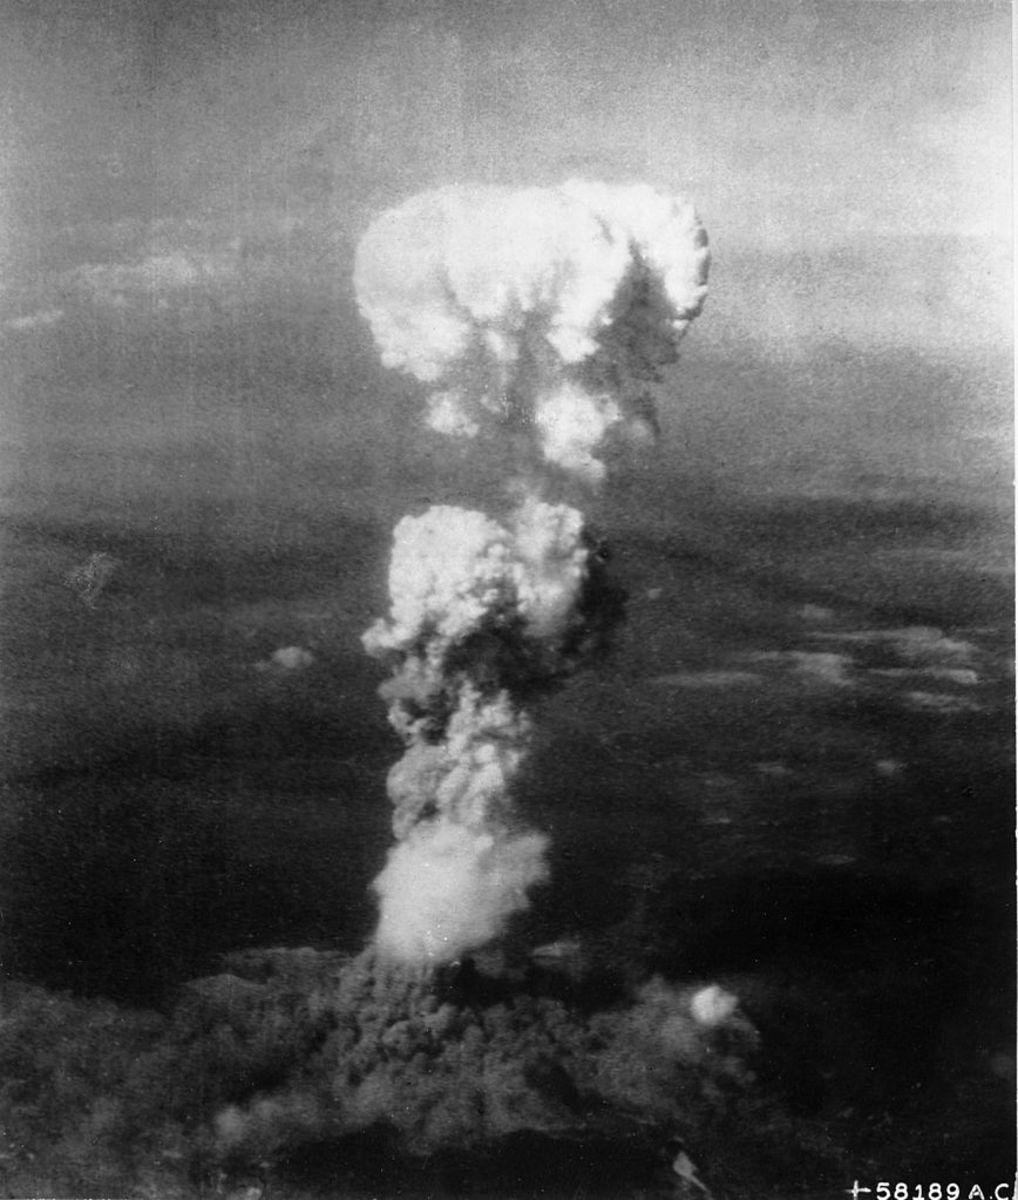 Effects of the Hiroshima Bombing